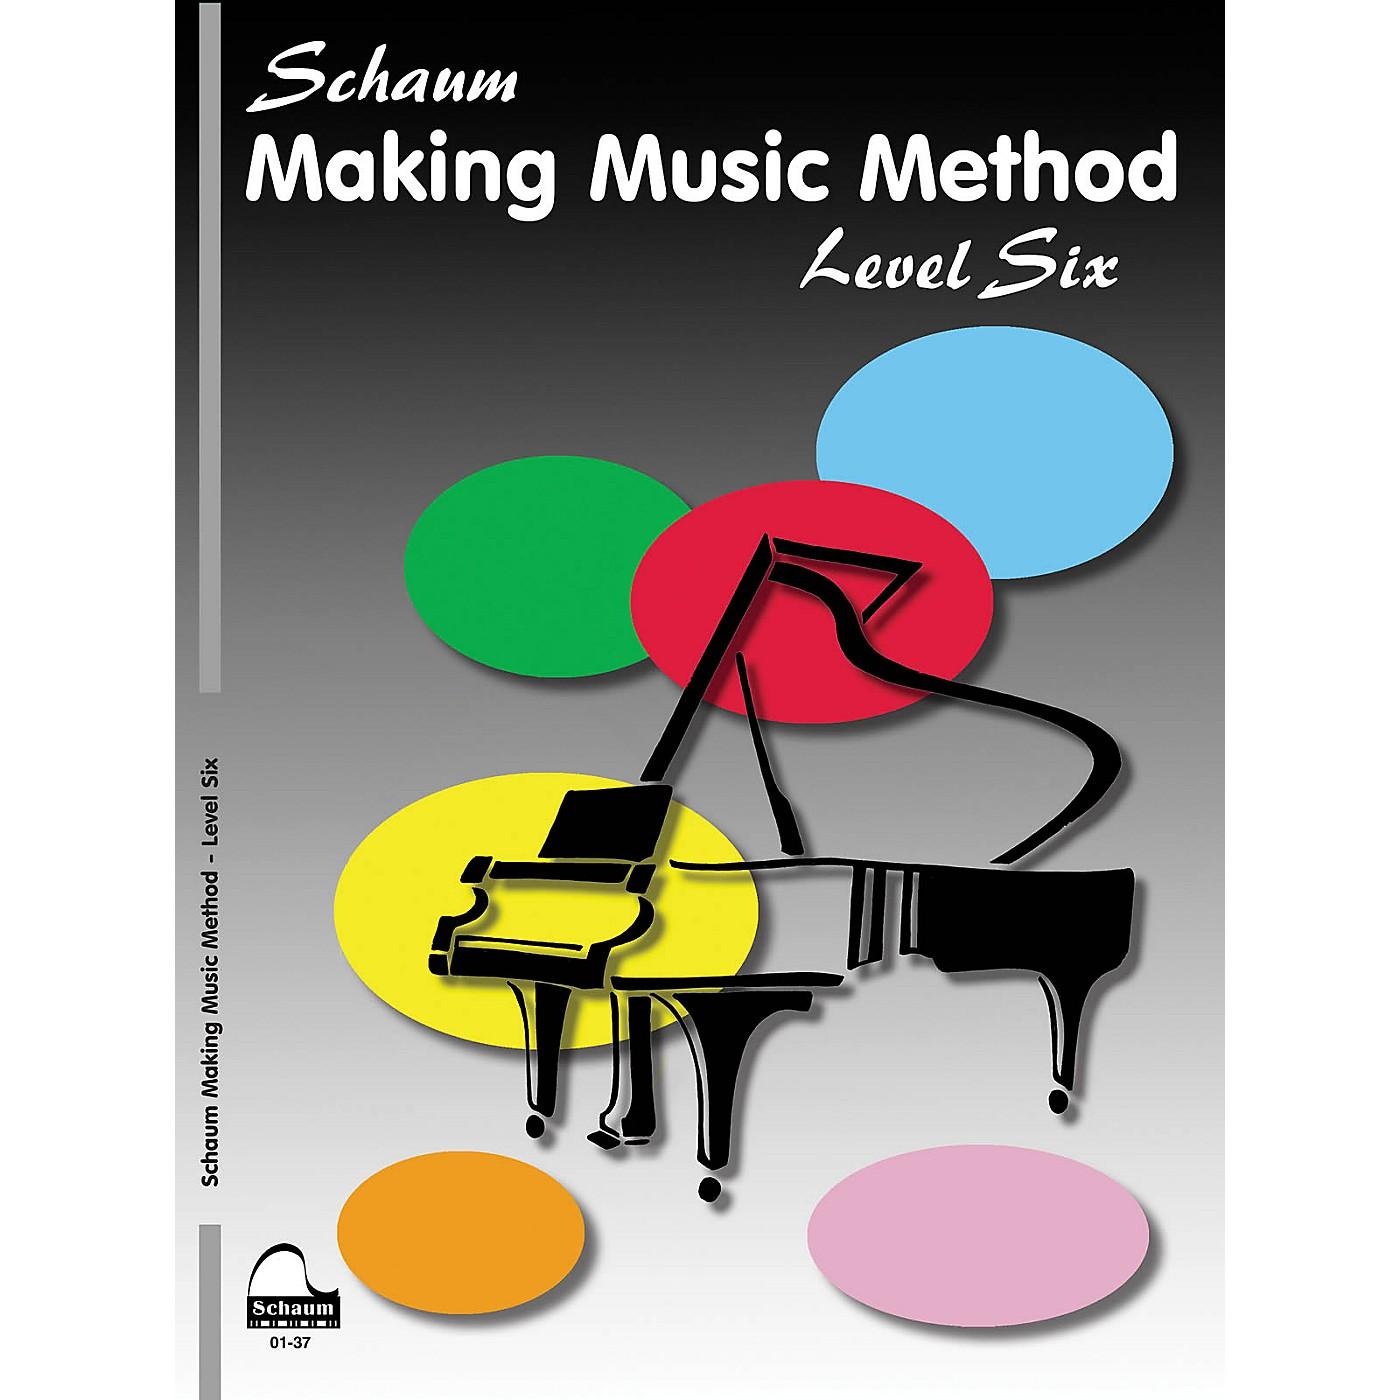 SCHAUM Making Music Method (Level 6 Advanced Level) Educational Piano Book by John W. Schaum thumbnail